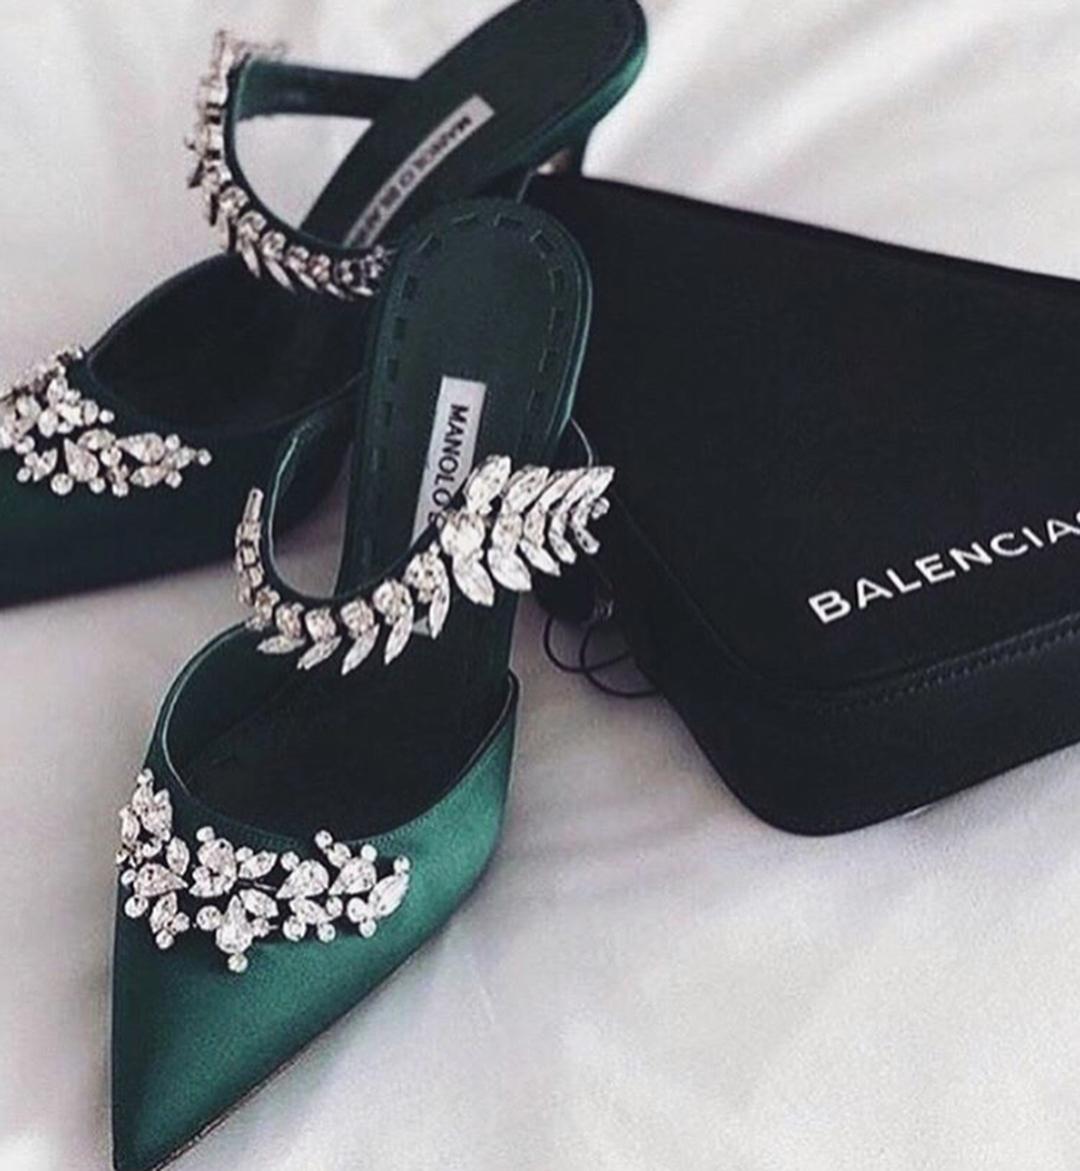 Dark Green Pointed Toe Strap Sandals With Rhinestones.